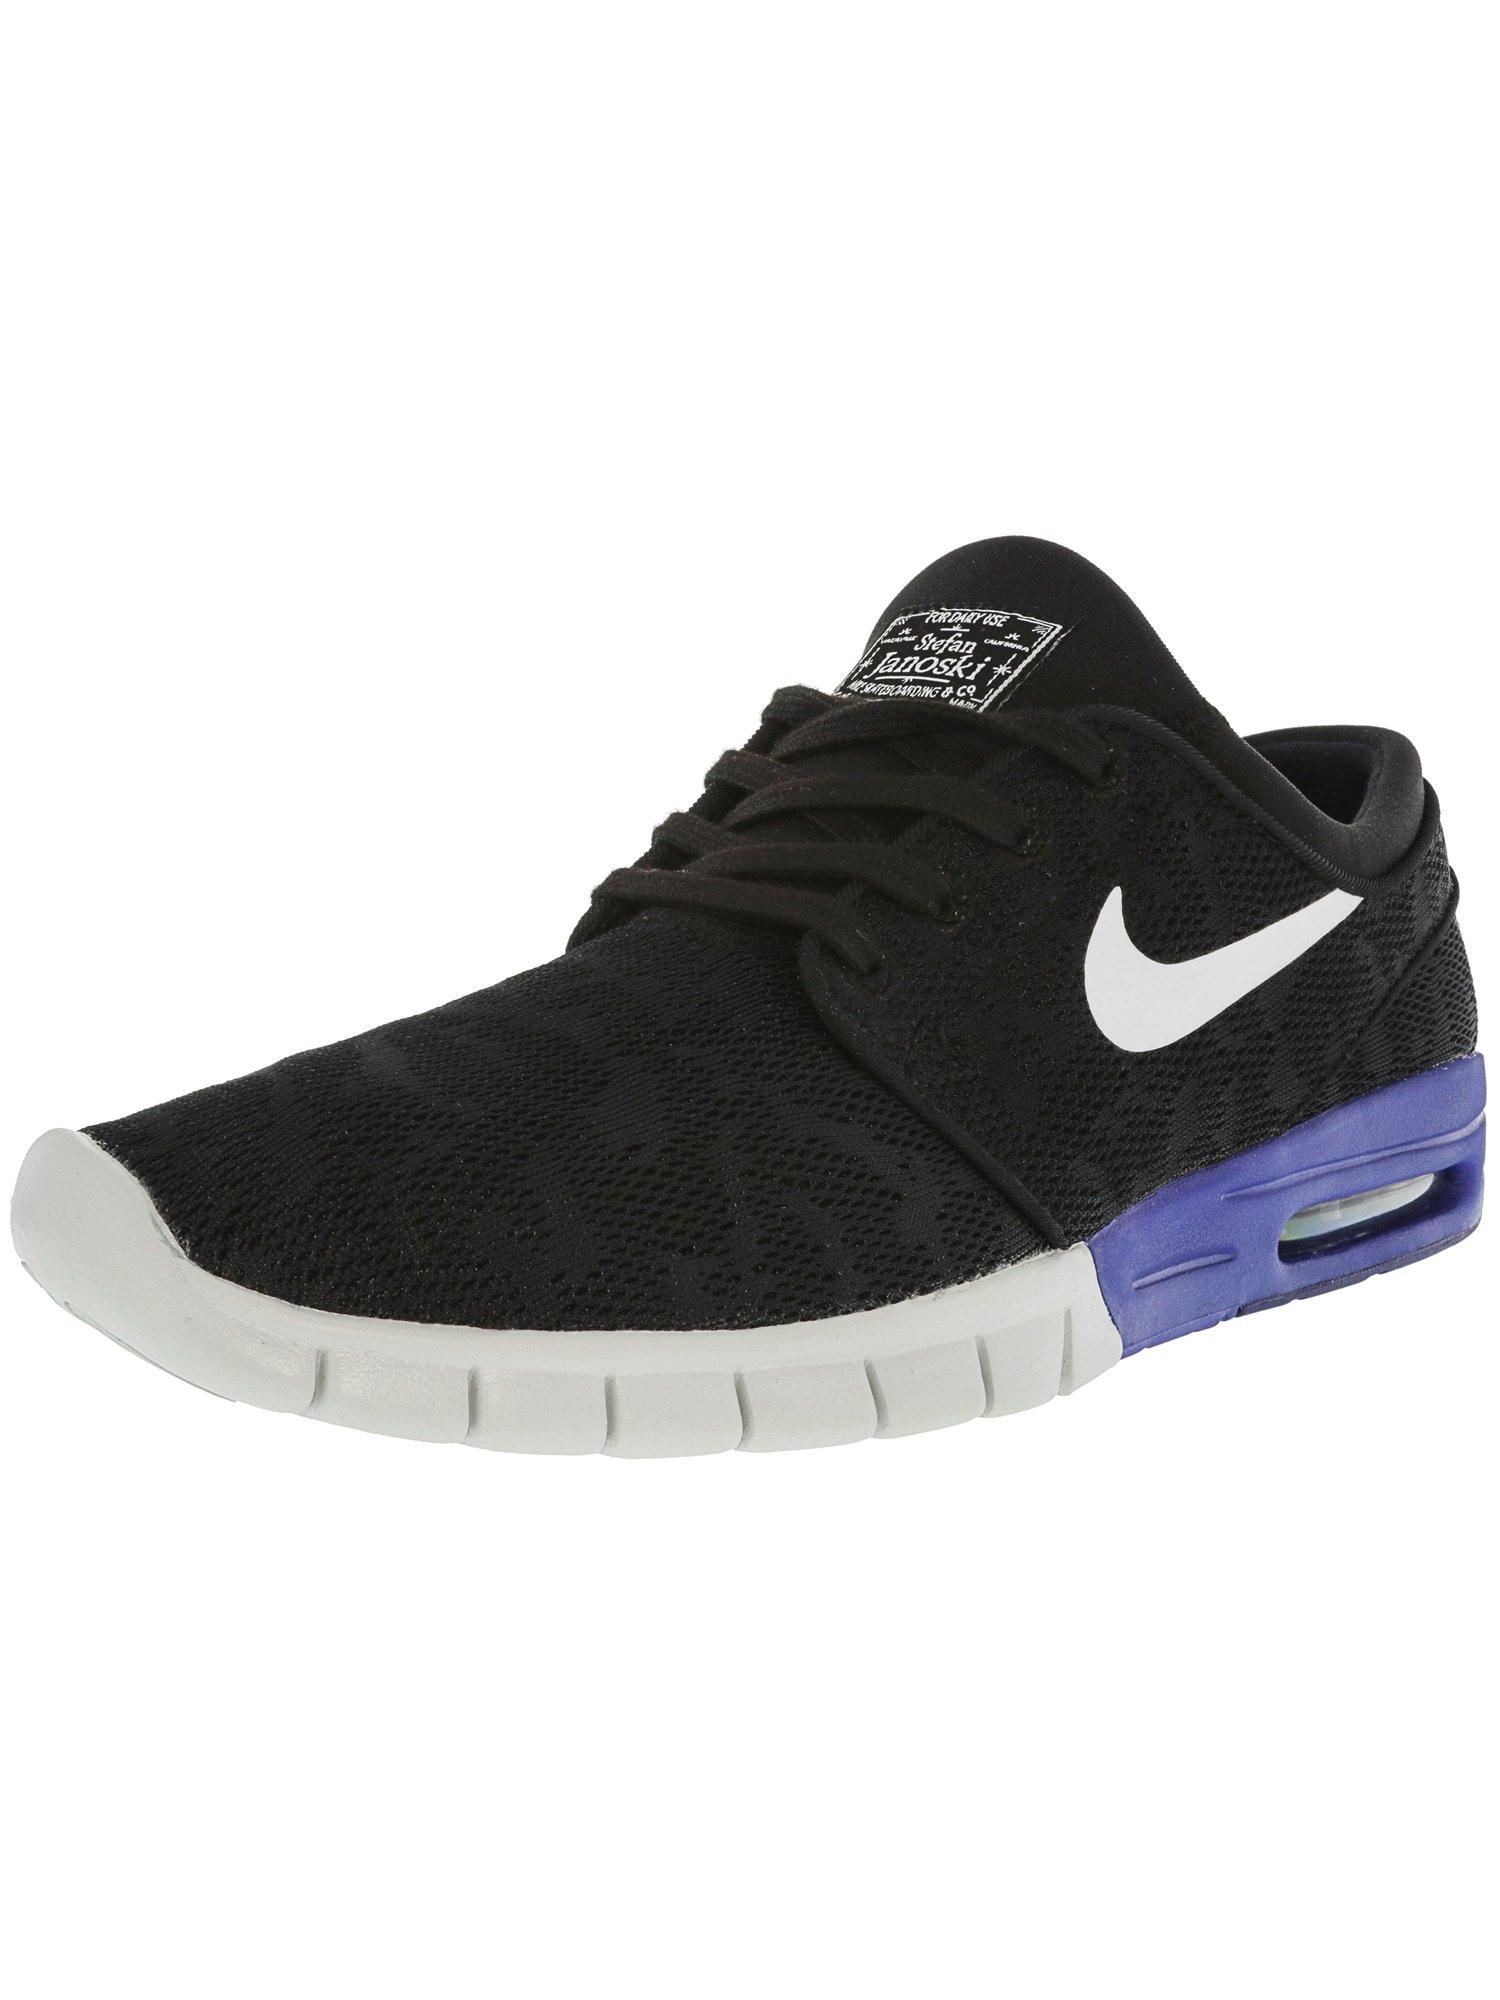 d4157bbf3d91 Nike Men s Stefan Janoski Max Black   White-Deep Night Ankle-High Running  Shoe